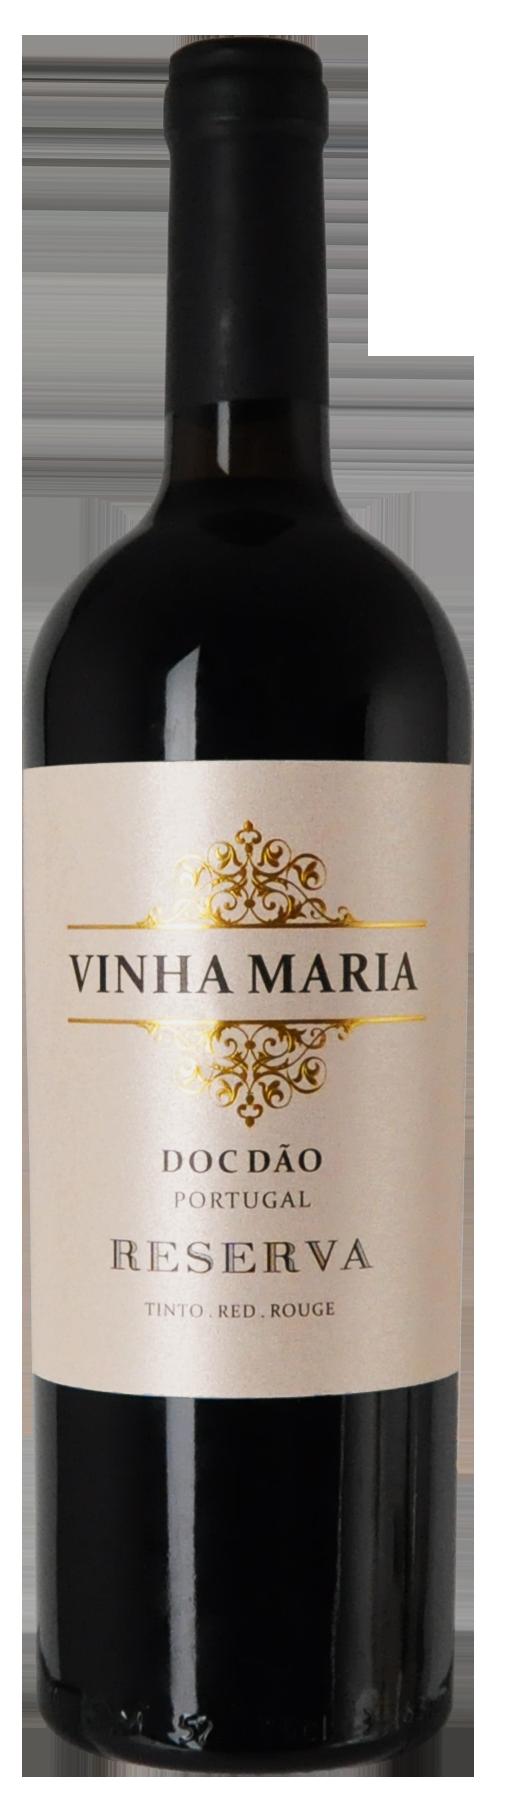 Vinha Maria Reserva Red